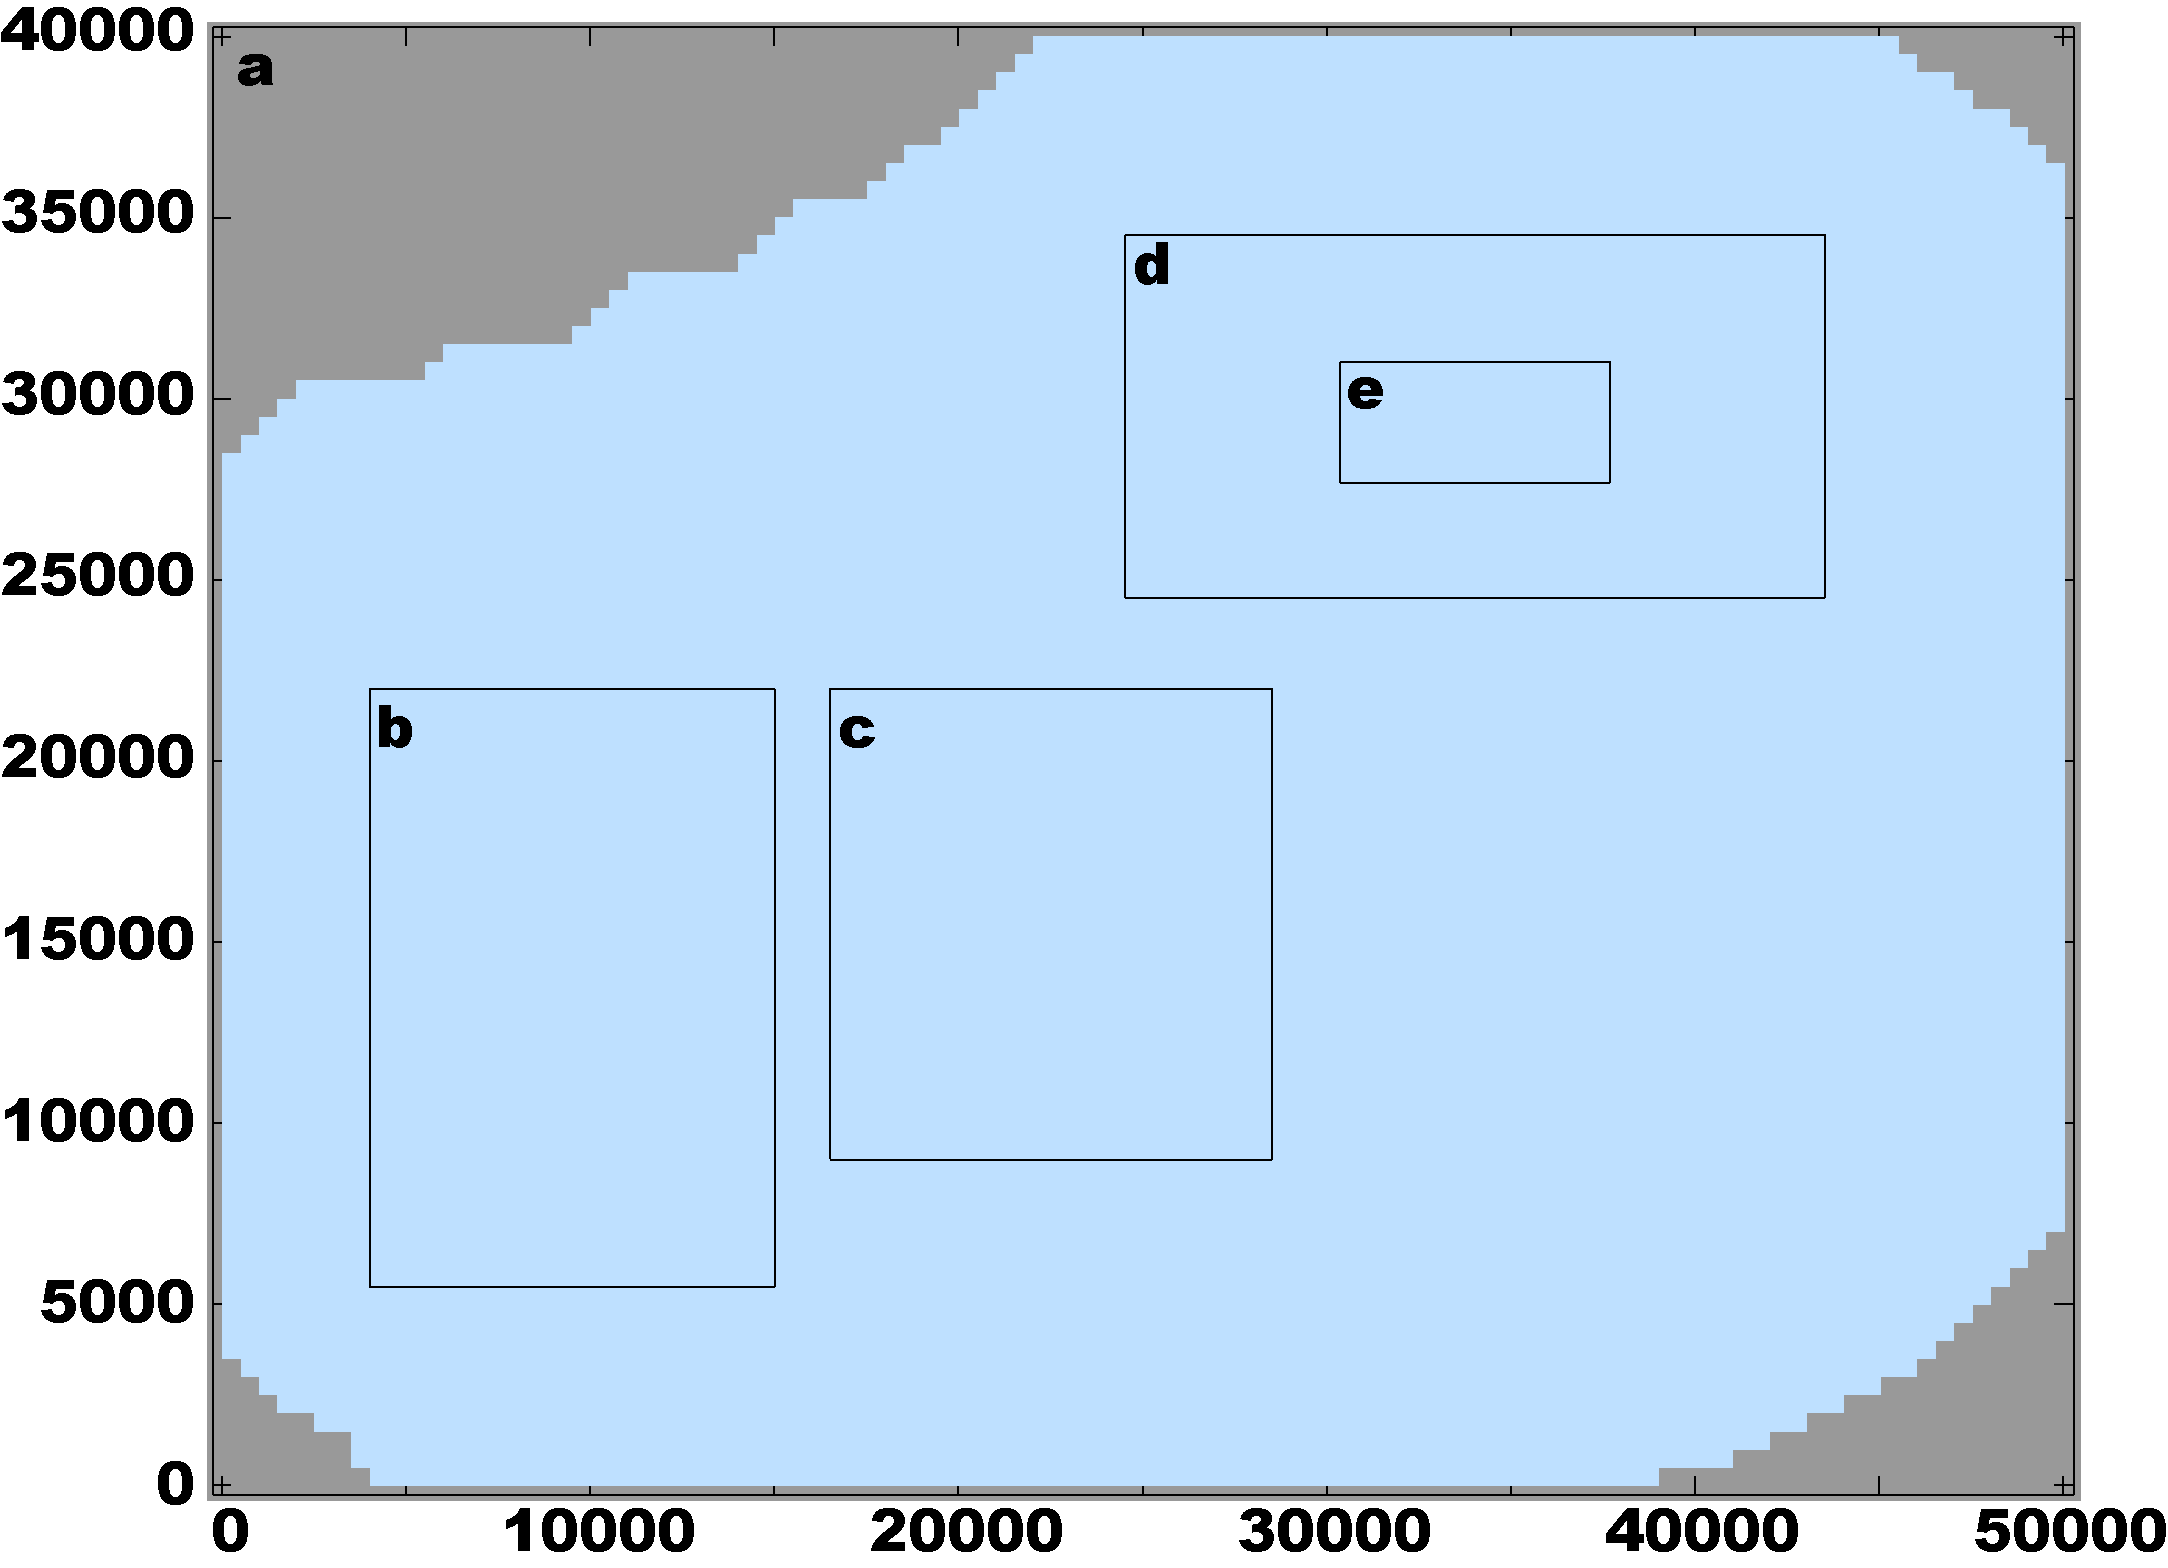 https://www.myroms.org/wiki/images/7/78/Lake_Jersey_grids.png